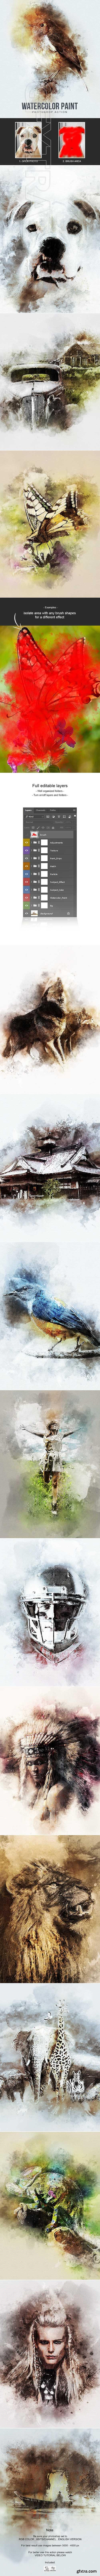 GraphicRiver - WatercolorPaint - Photoshop Action 22341879